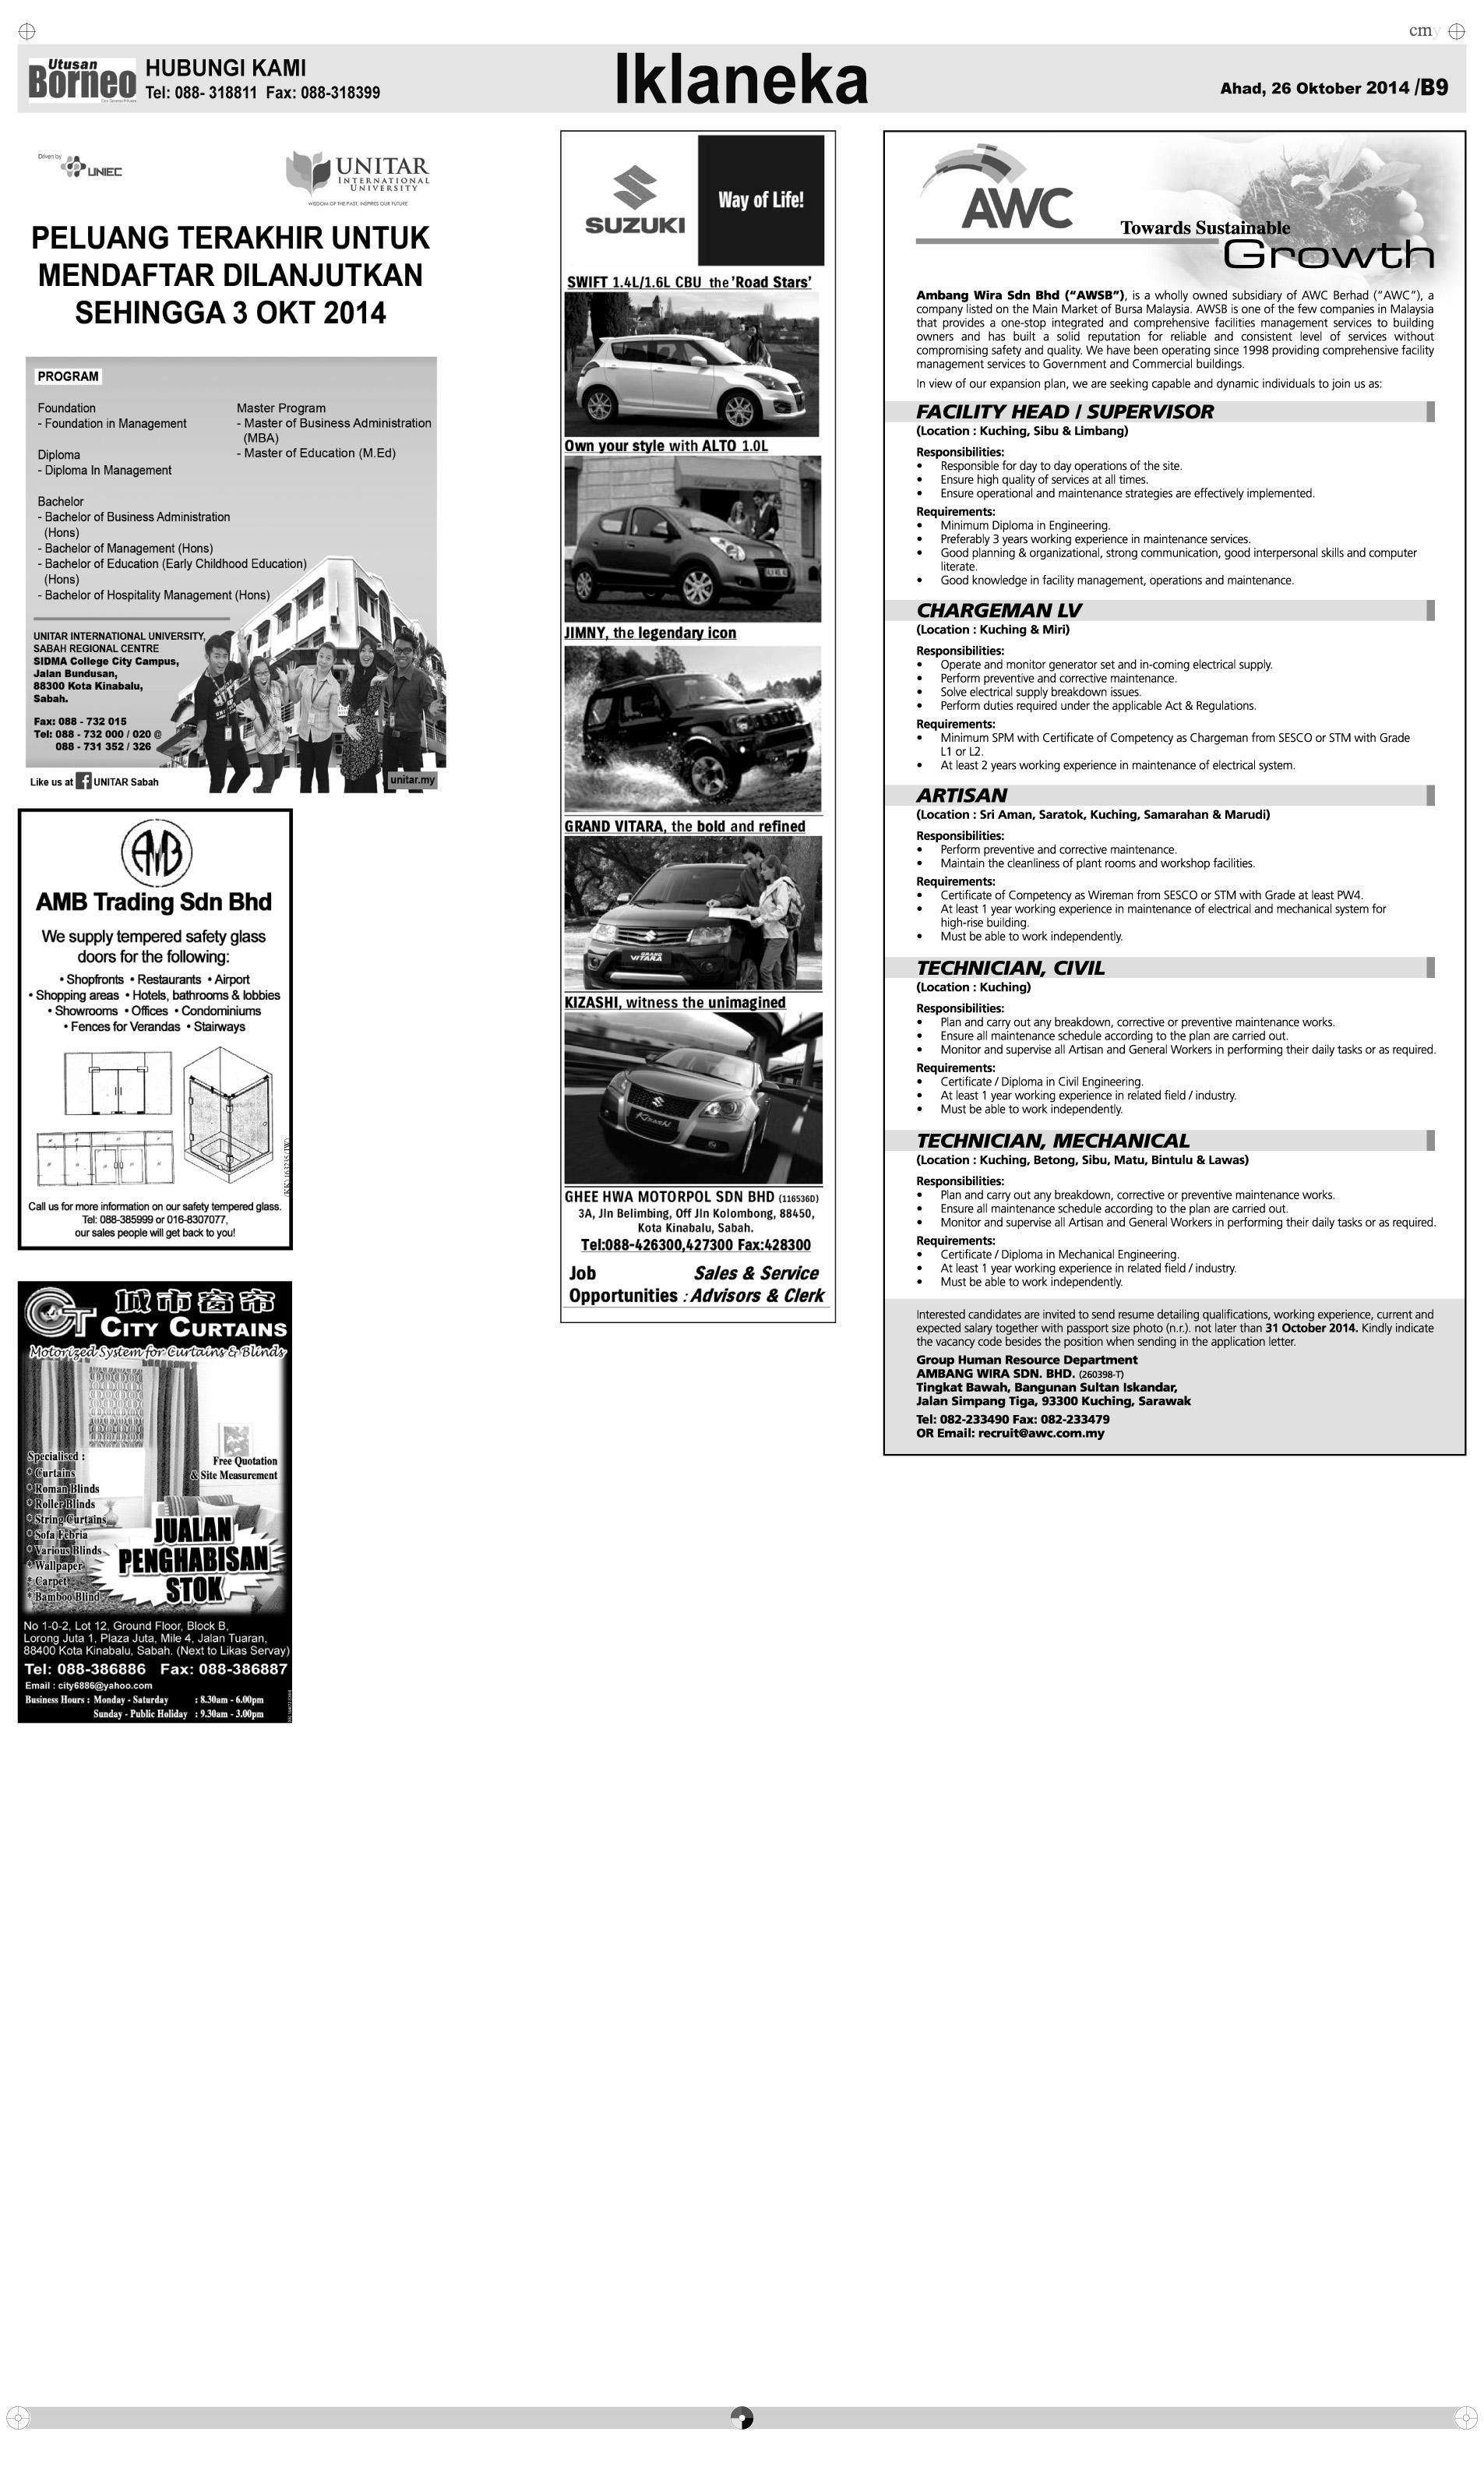 Sunday - Oct 26   The Borneo Post Classifieds